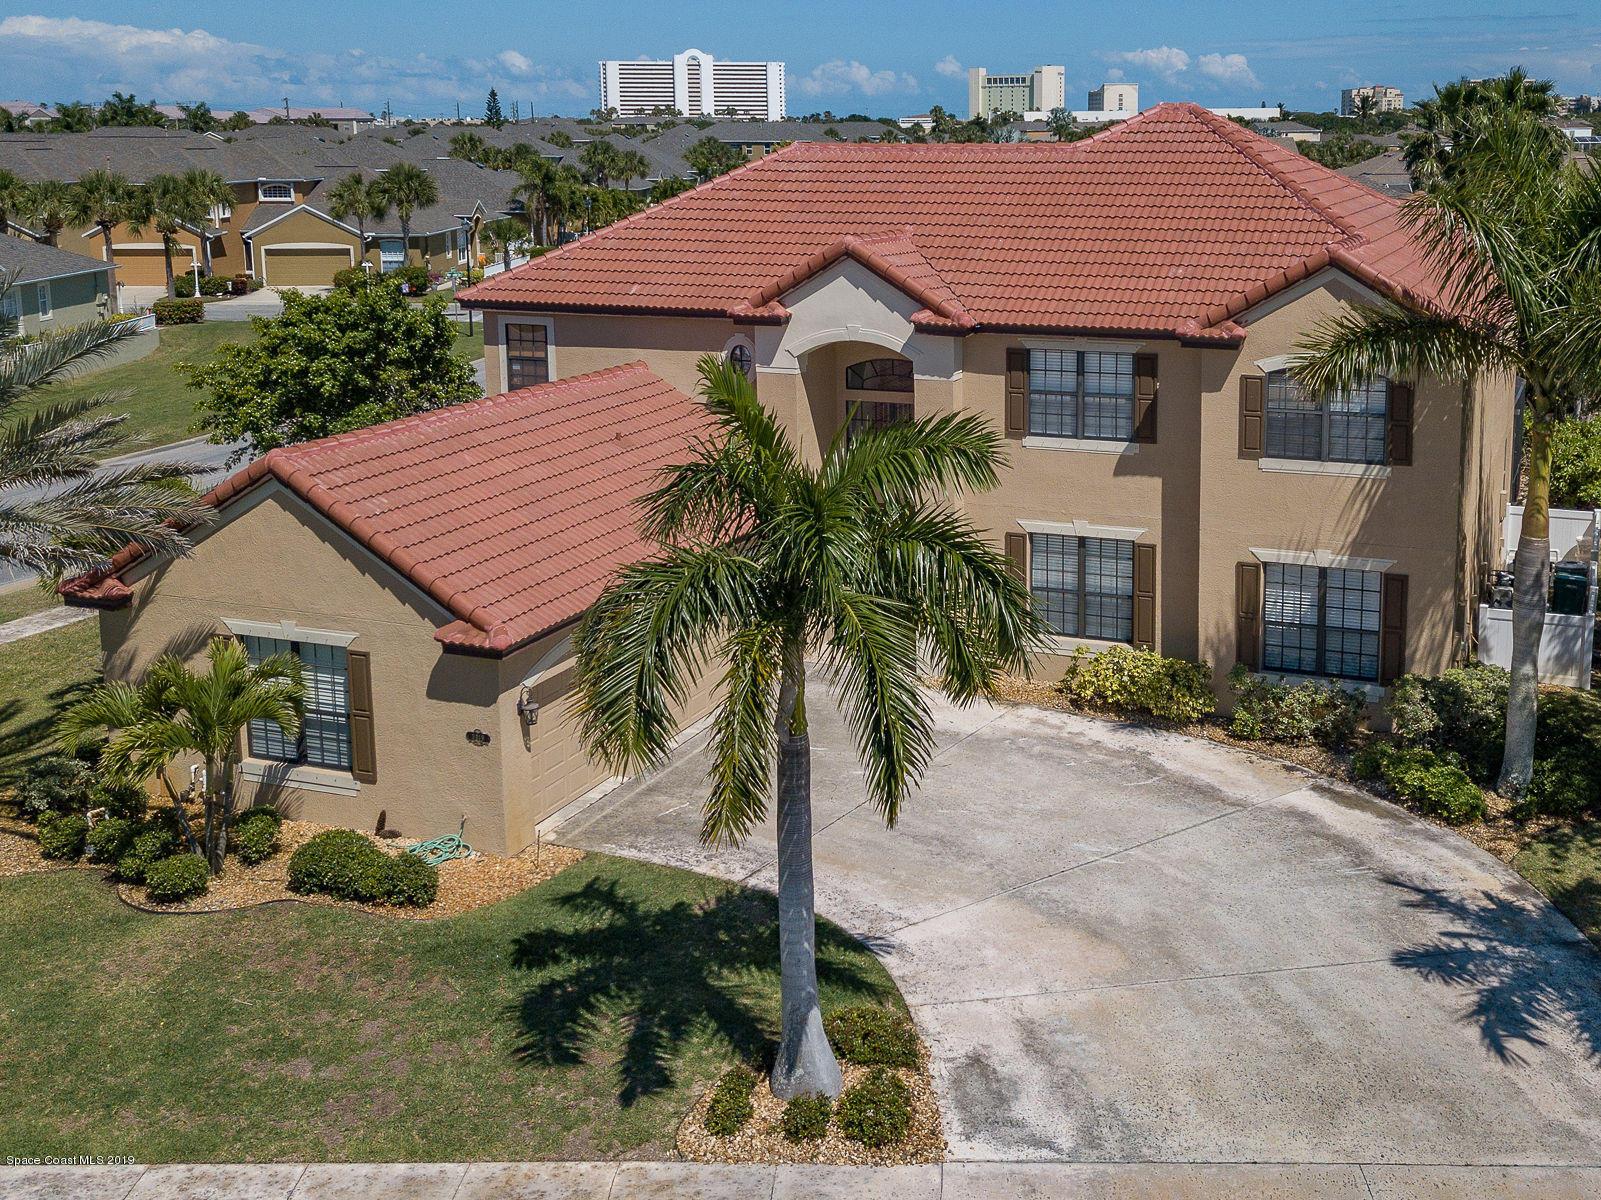 Single Family Home for Sale at 3319 Poseidon 3319 Poseidon Melbourne, Florida 32903 United States